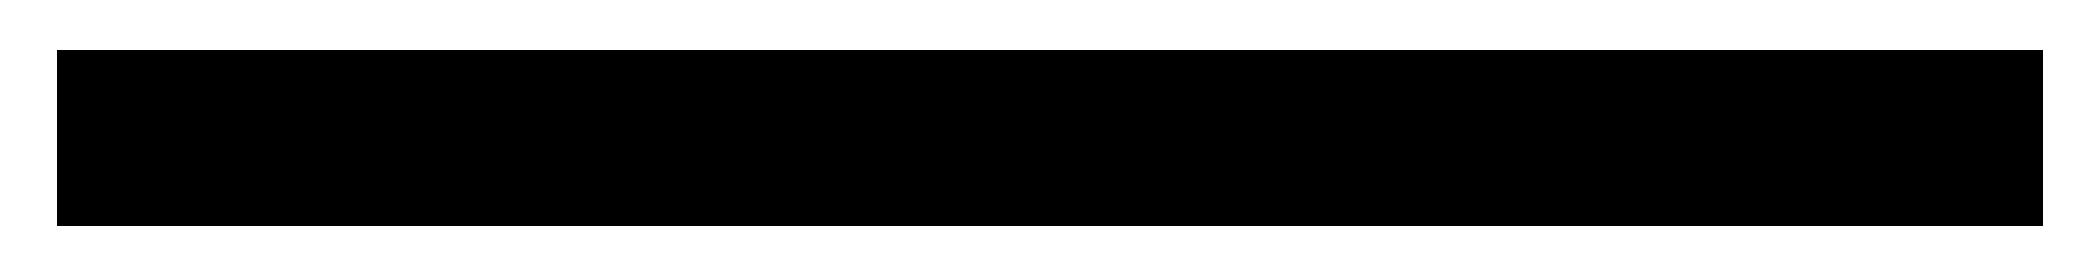 Gold Boutique logo